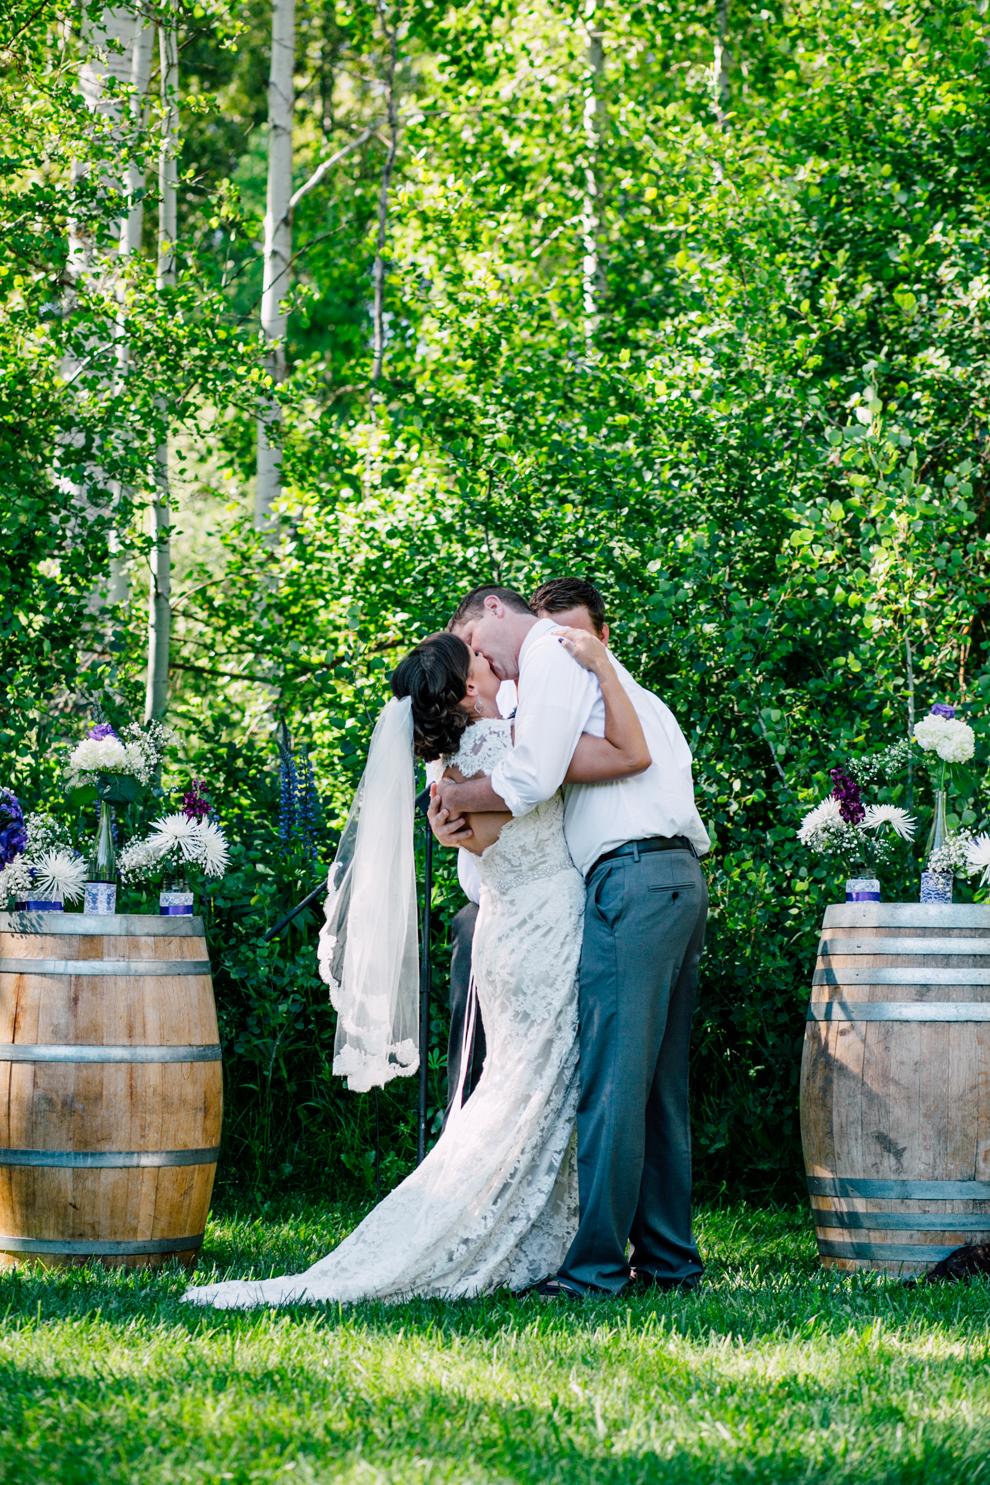 067-leavenworth-mountain-springs-lodge-wedding-karena-saul-katheryn-moran-photography.jpg